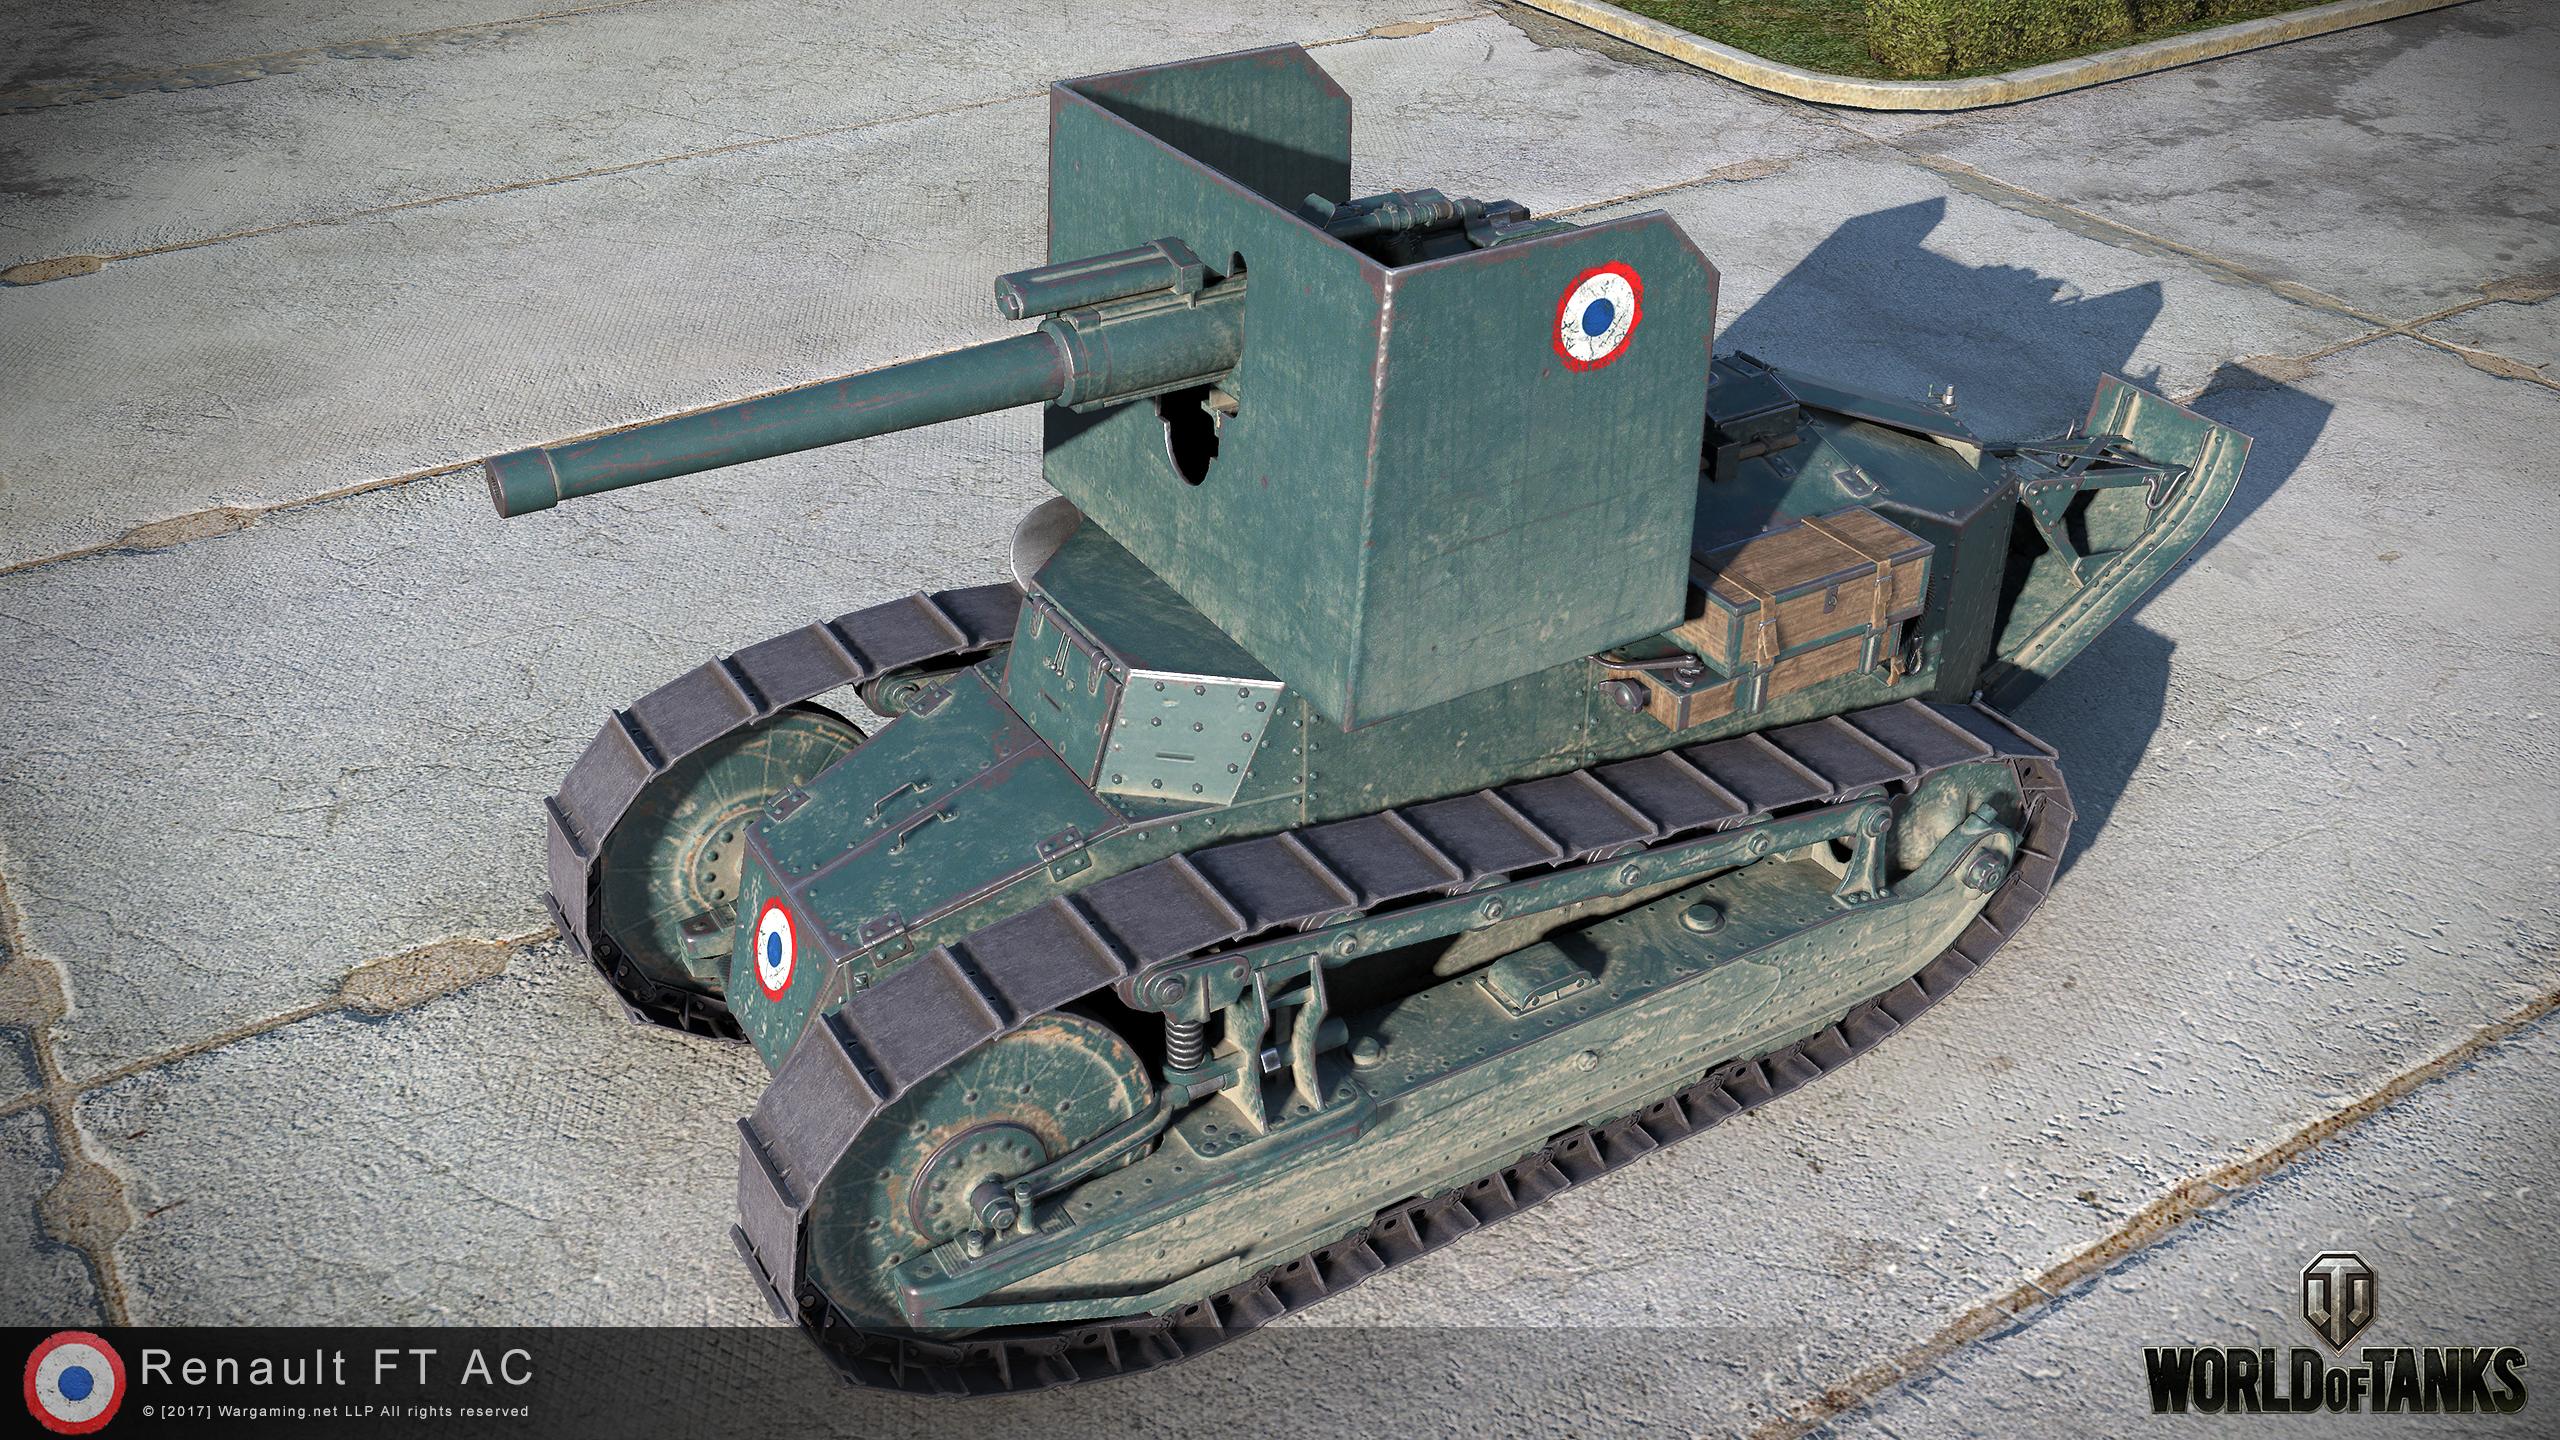 Renault Ft Ac Hd Renders 9 19 The Armored Patrol